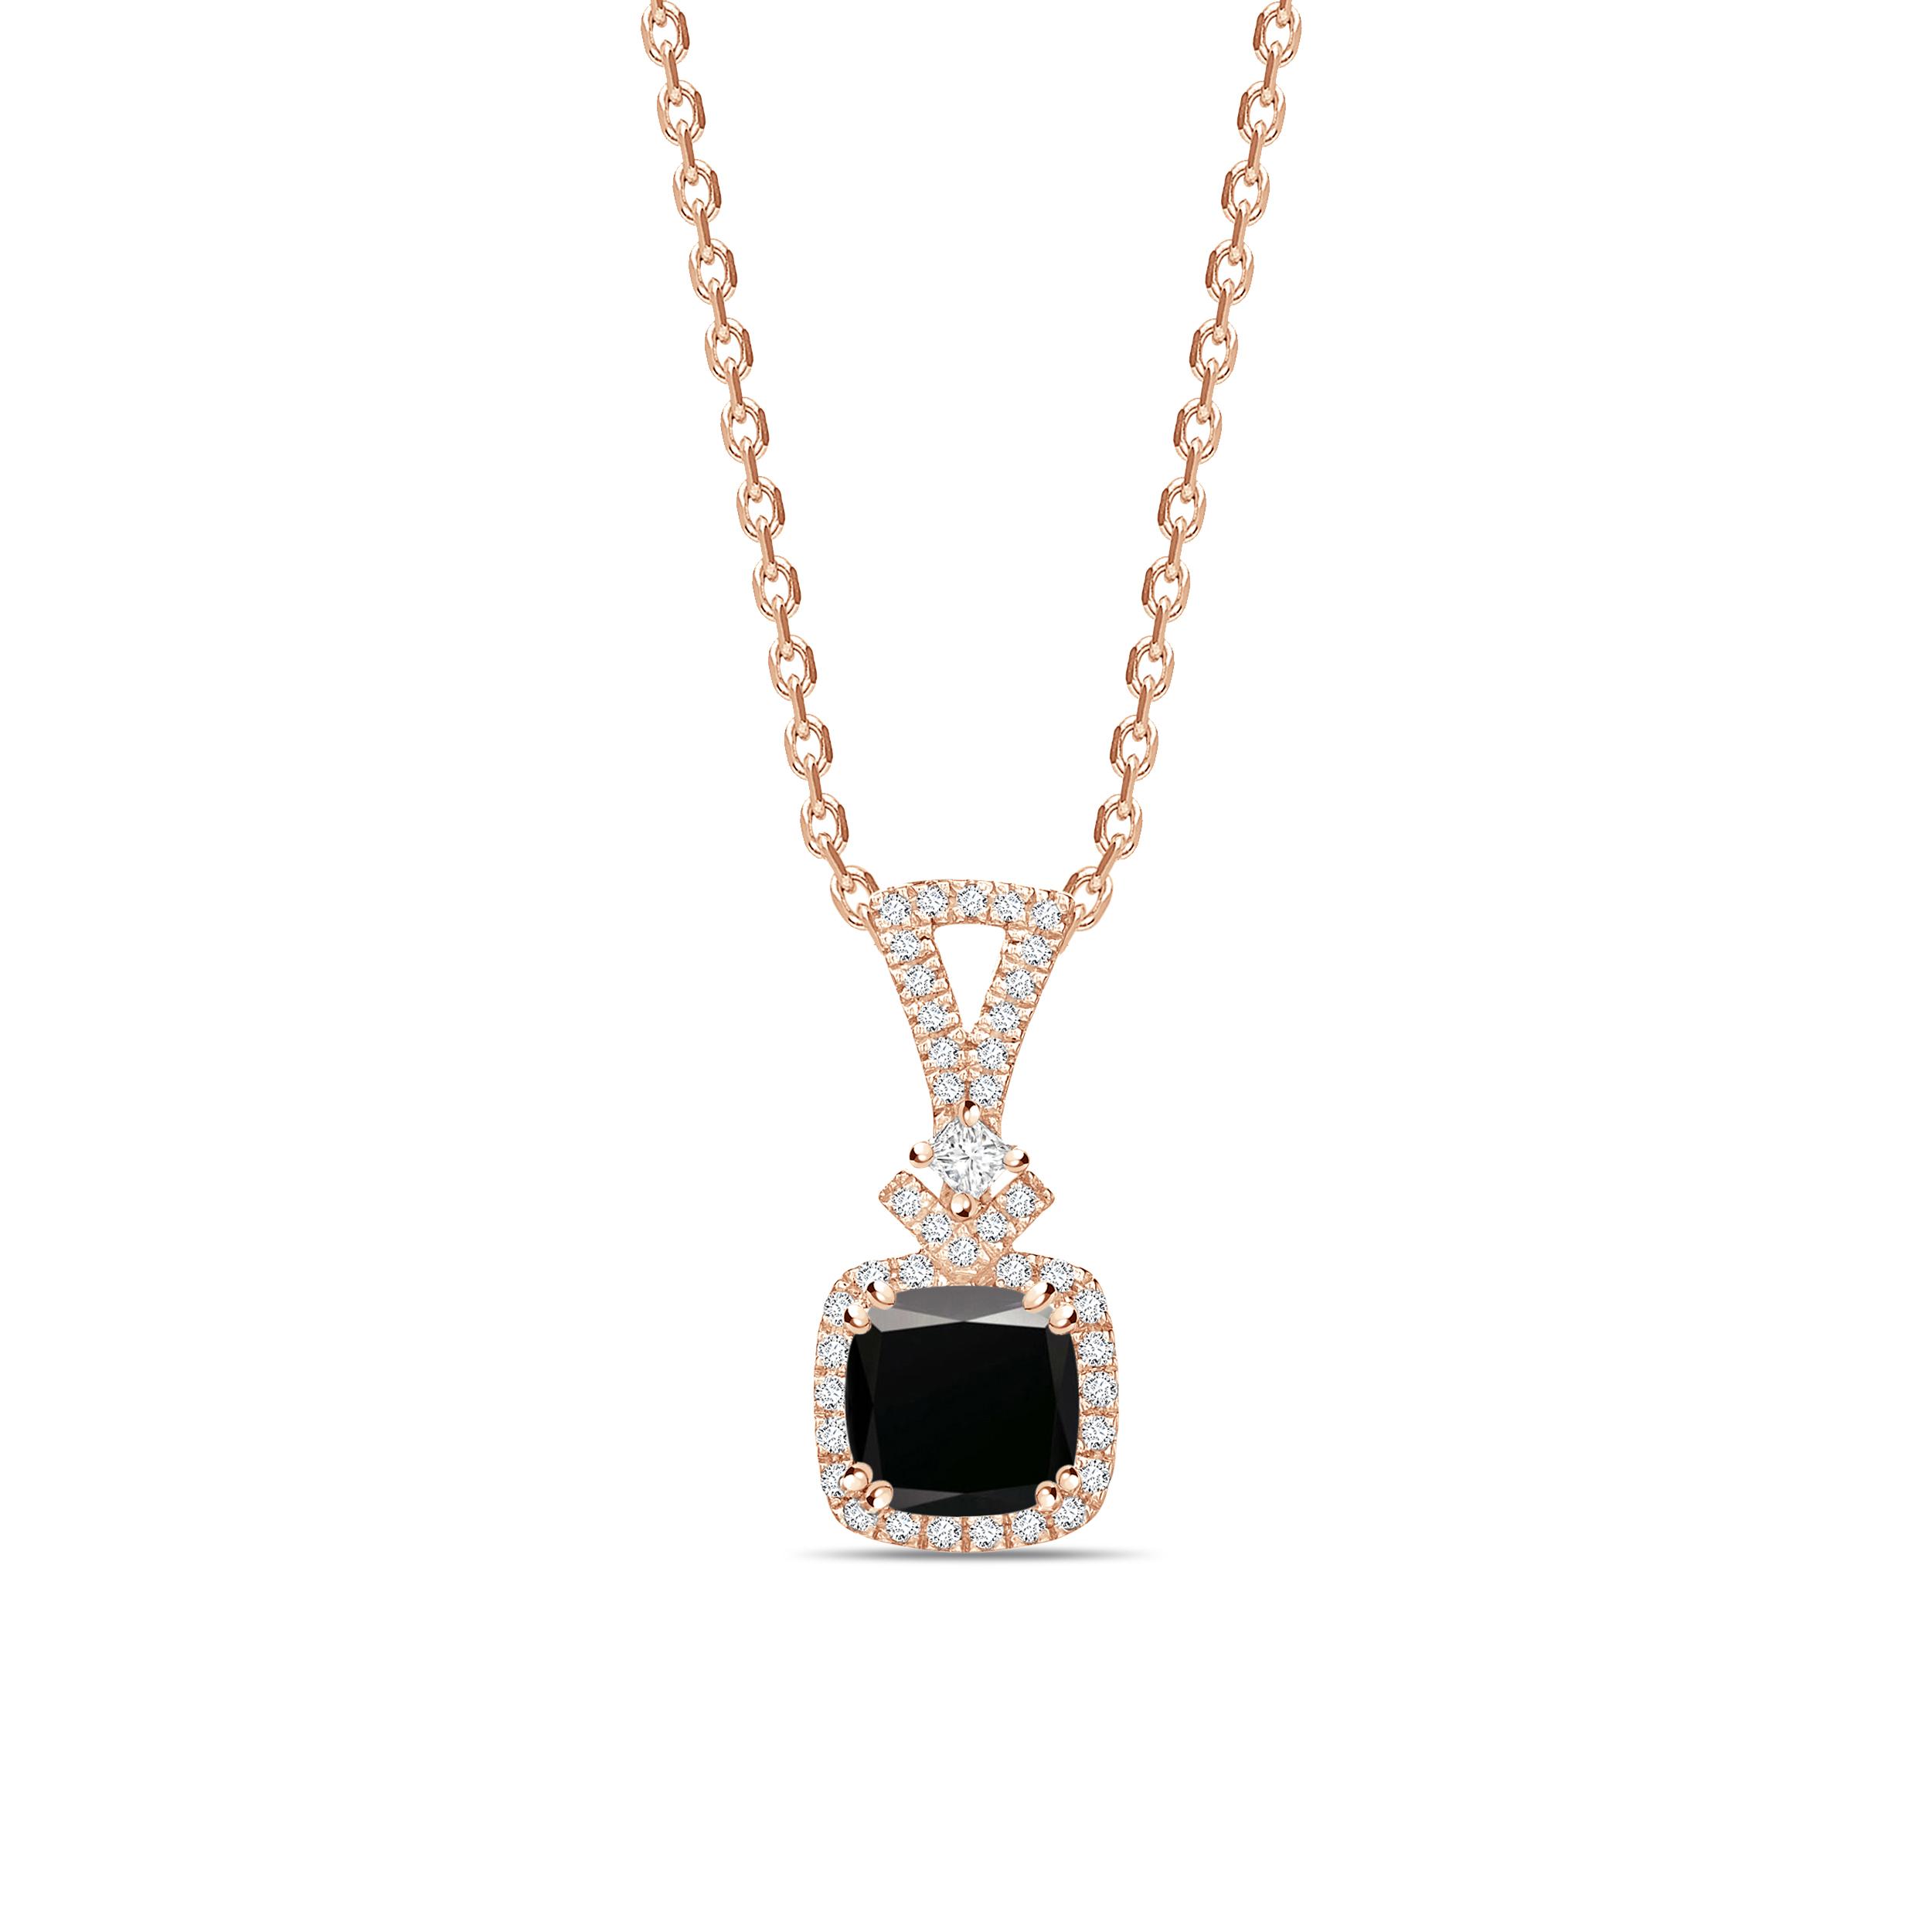 Modern Design Princess Cut Black Diamond Solitaire Pendants Necklace